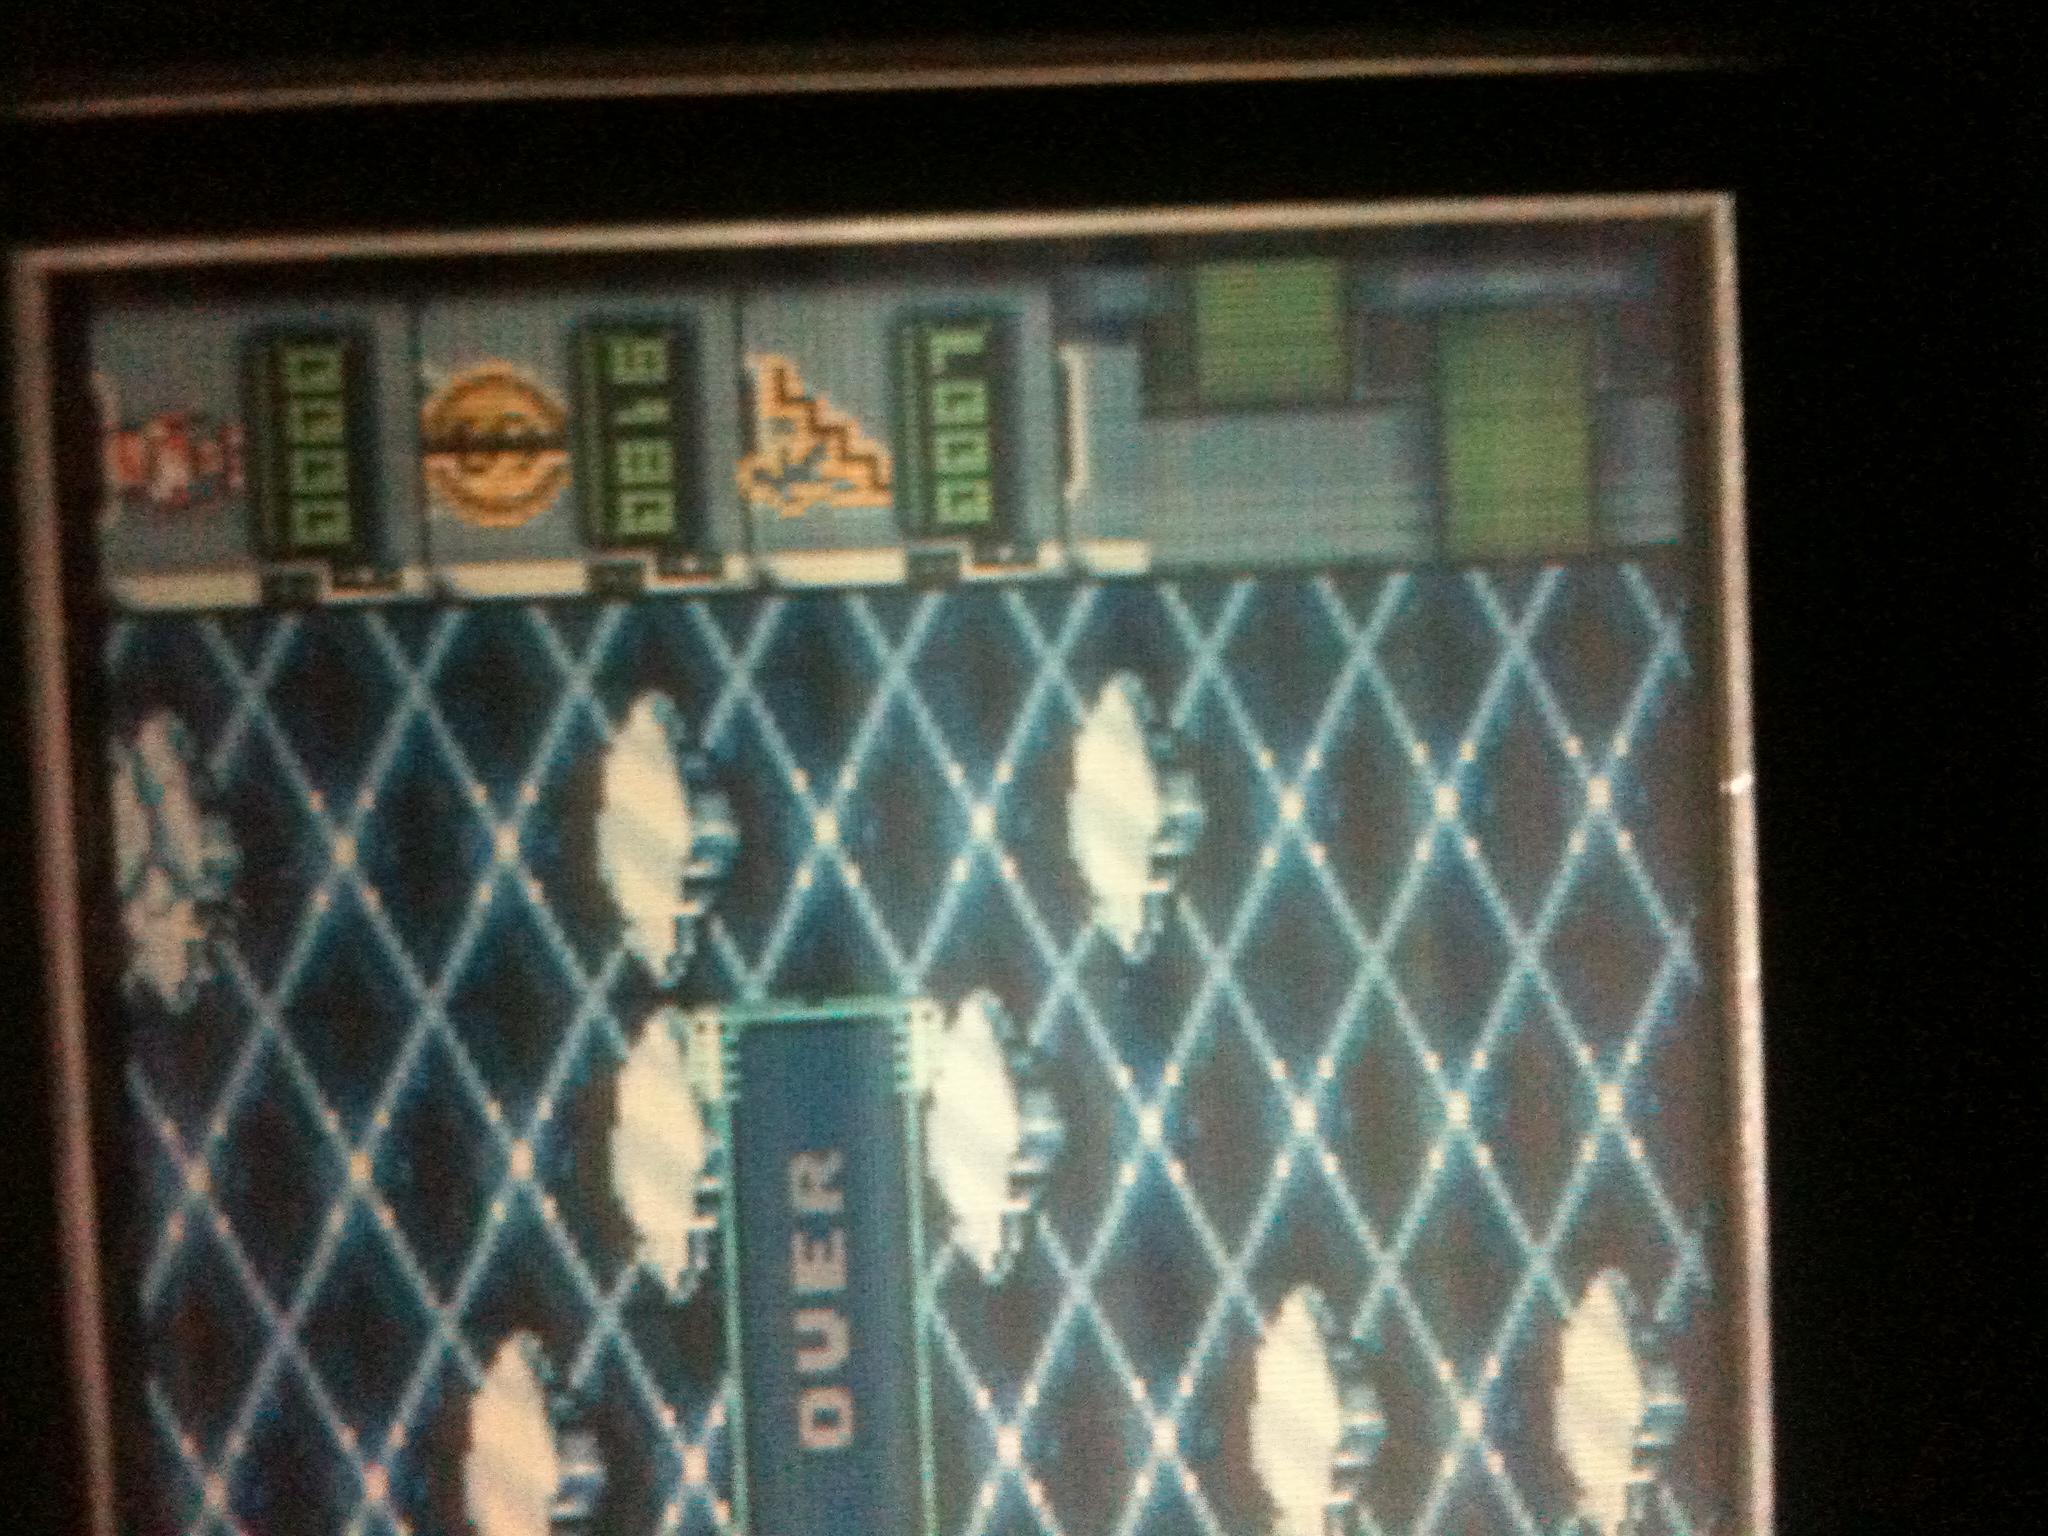 Games Explosion: Ice Jumper [Medium] 816 points